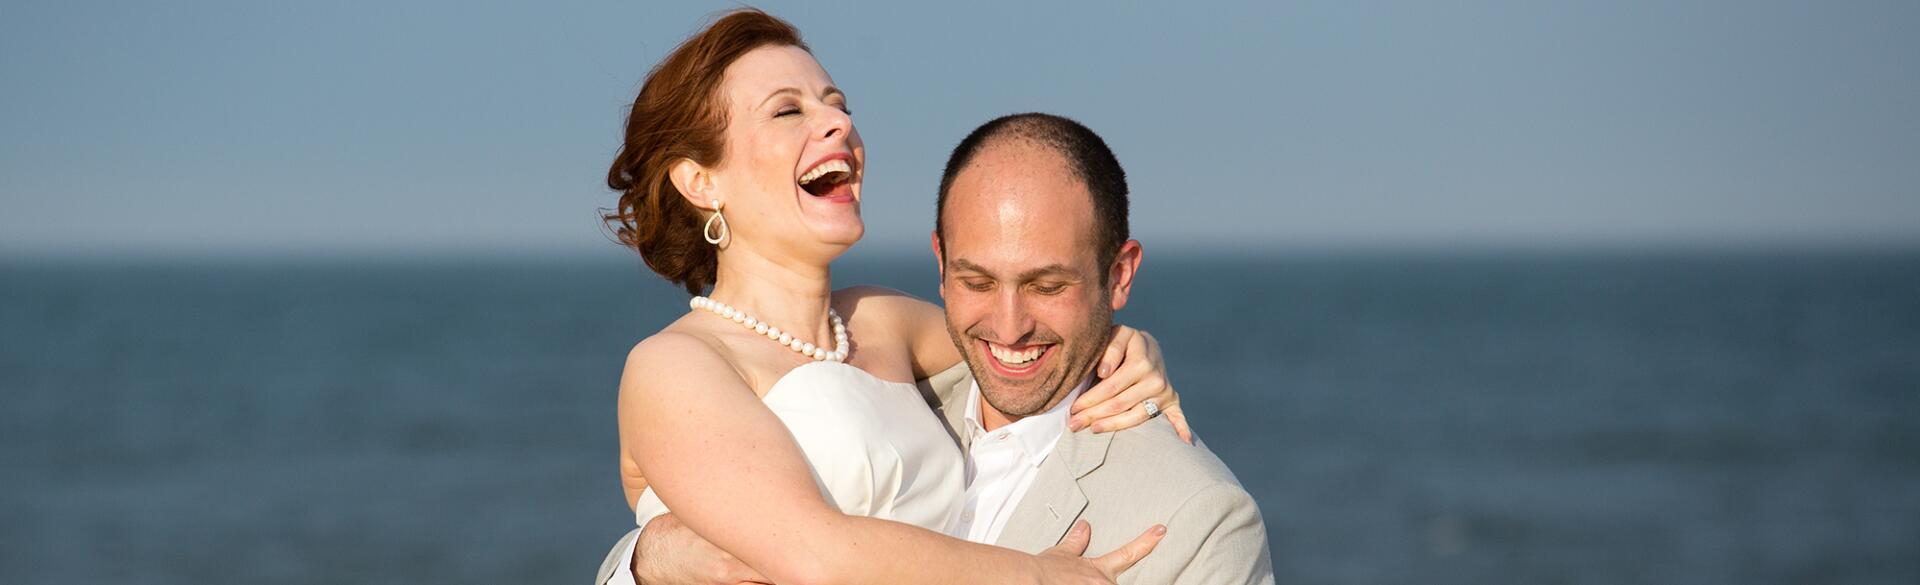 Married_without_kids_20130511-sachajason-173_2000.jpg